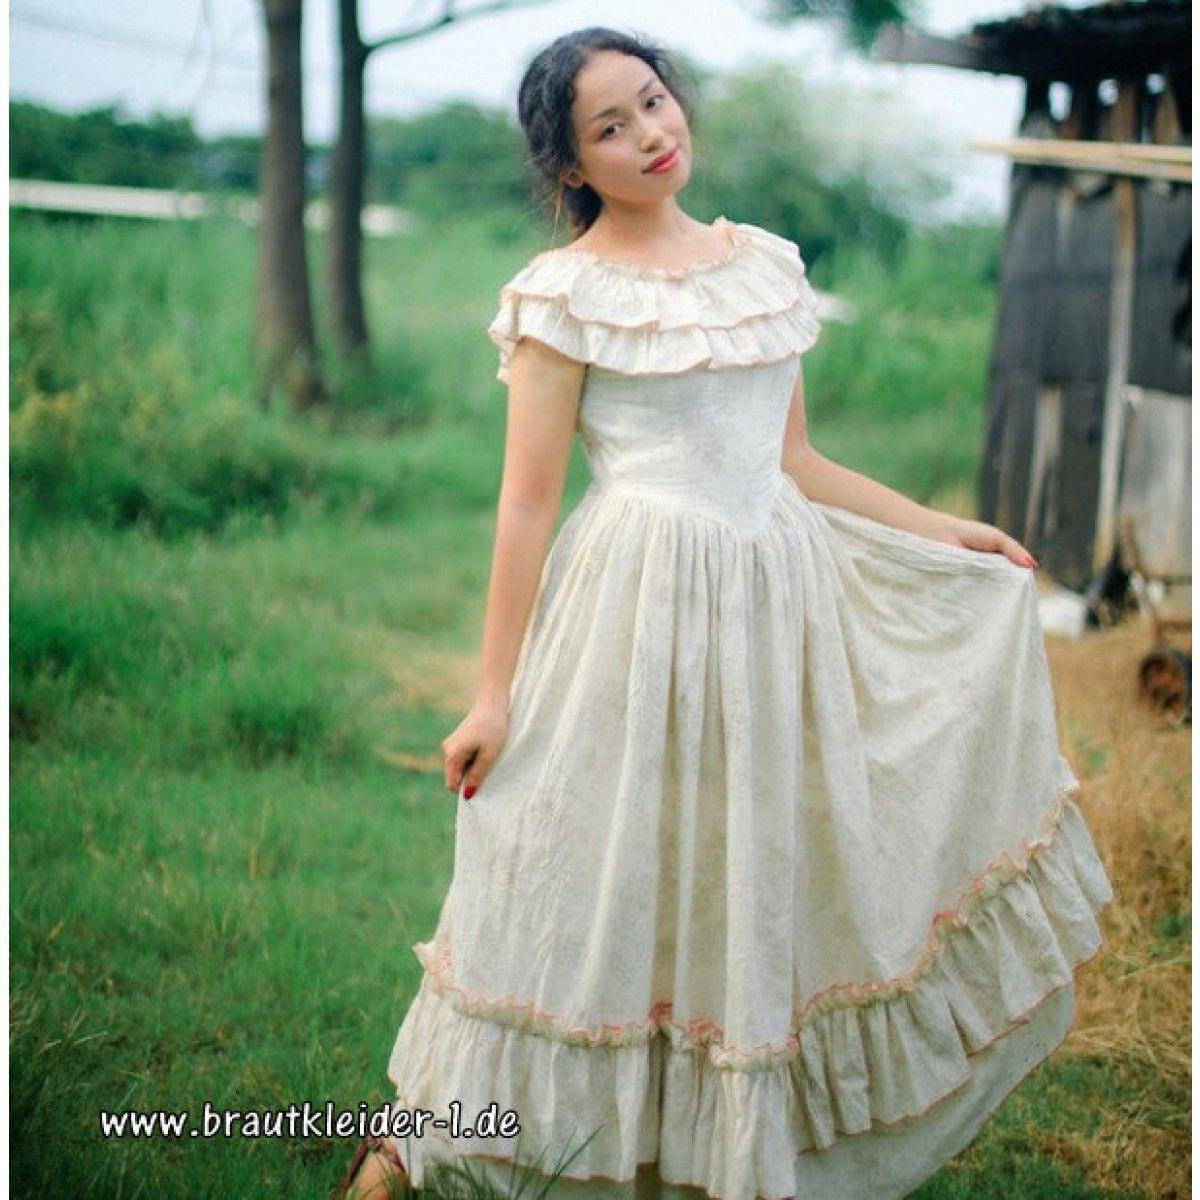 Baumwoll Vintage Kleid Fuer Den Standesamt Lang Braut